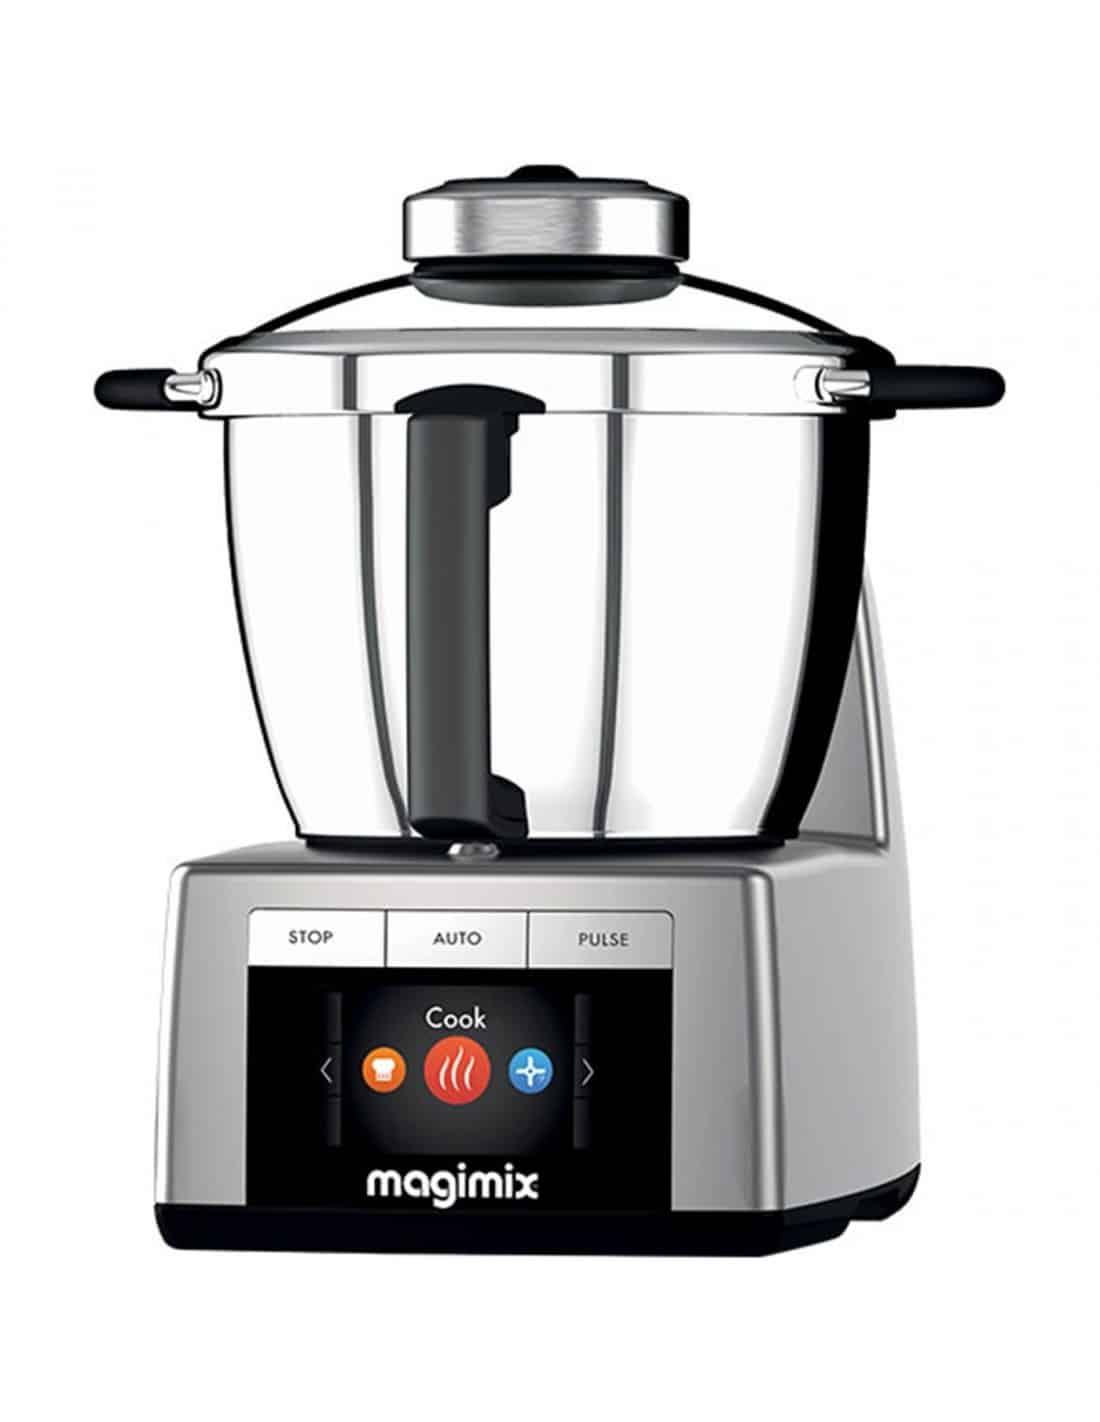 Robot de cozinha cook expert da magimix vers o uk fr it mimocook loja online - Robot cuiseur magimix cook expert ...